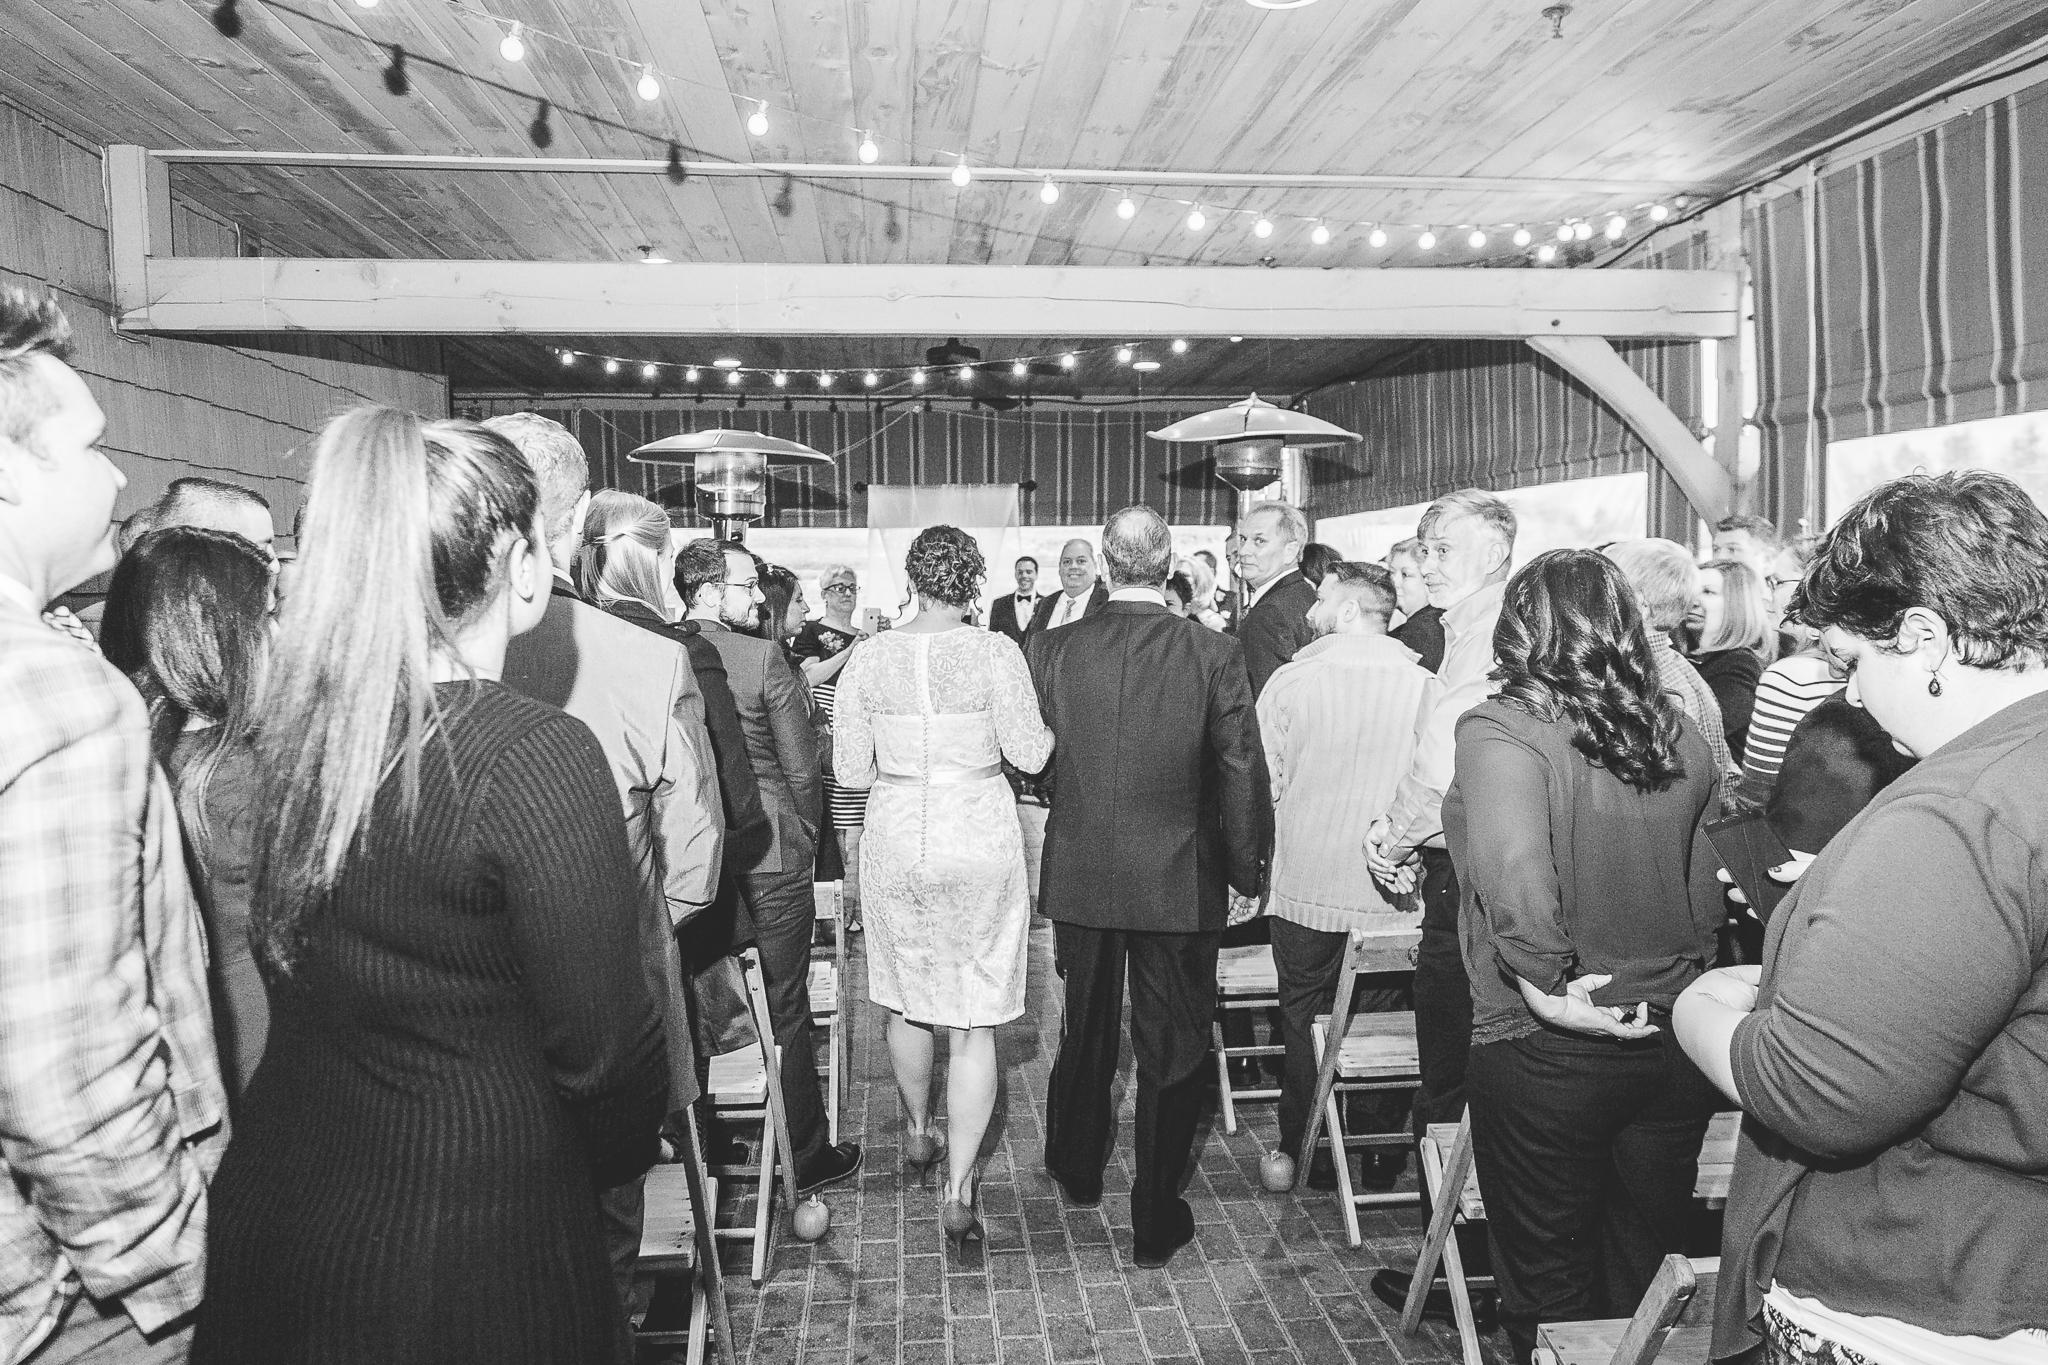 camuglia-whomstudio-chelsea_and_andy-nycphotographer-wedding-brooklyn-buffalo-timberlodge-069-5481.jpg